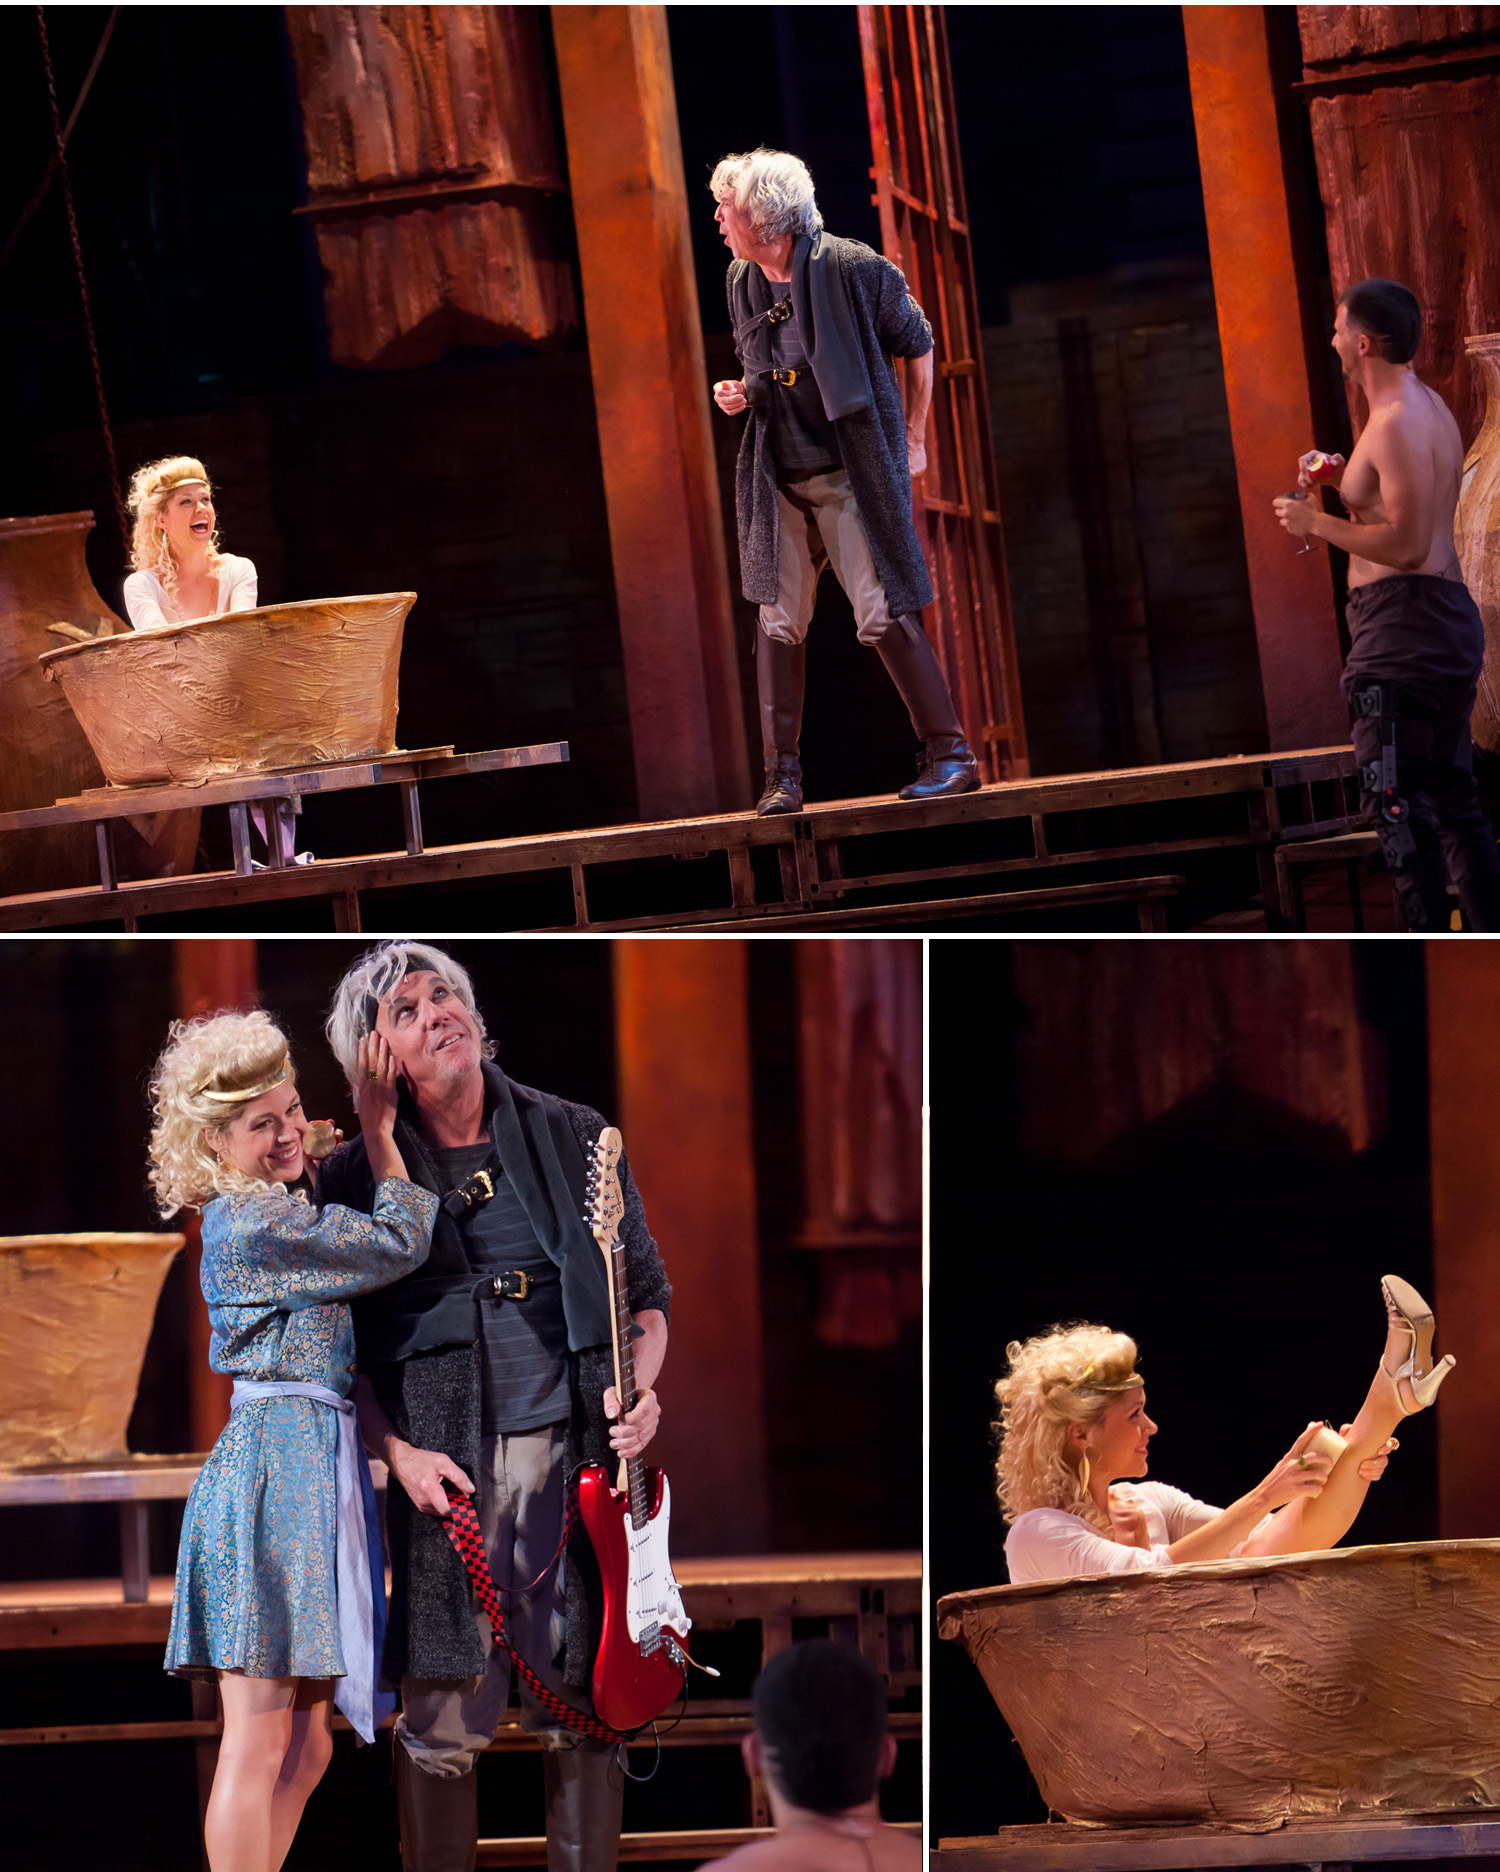 Live dramatic stage production photography by Jennifer Koskinen